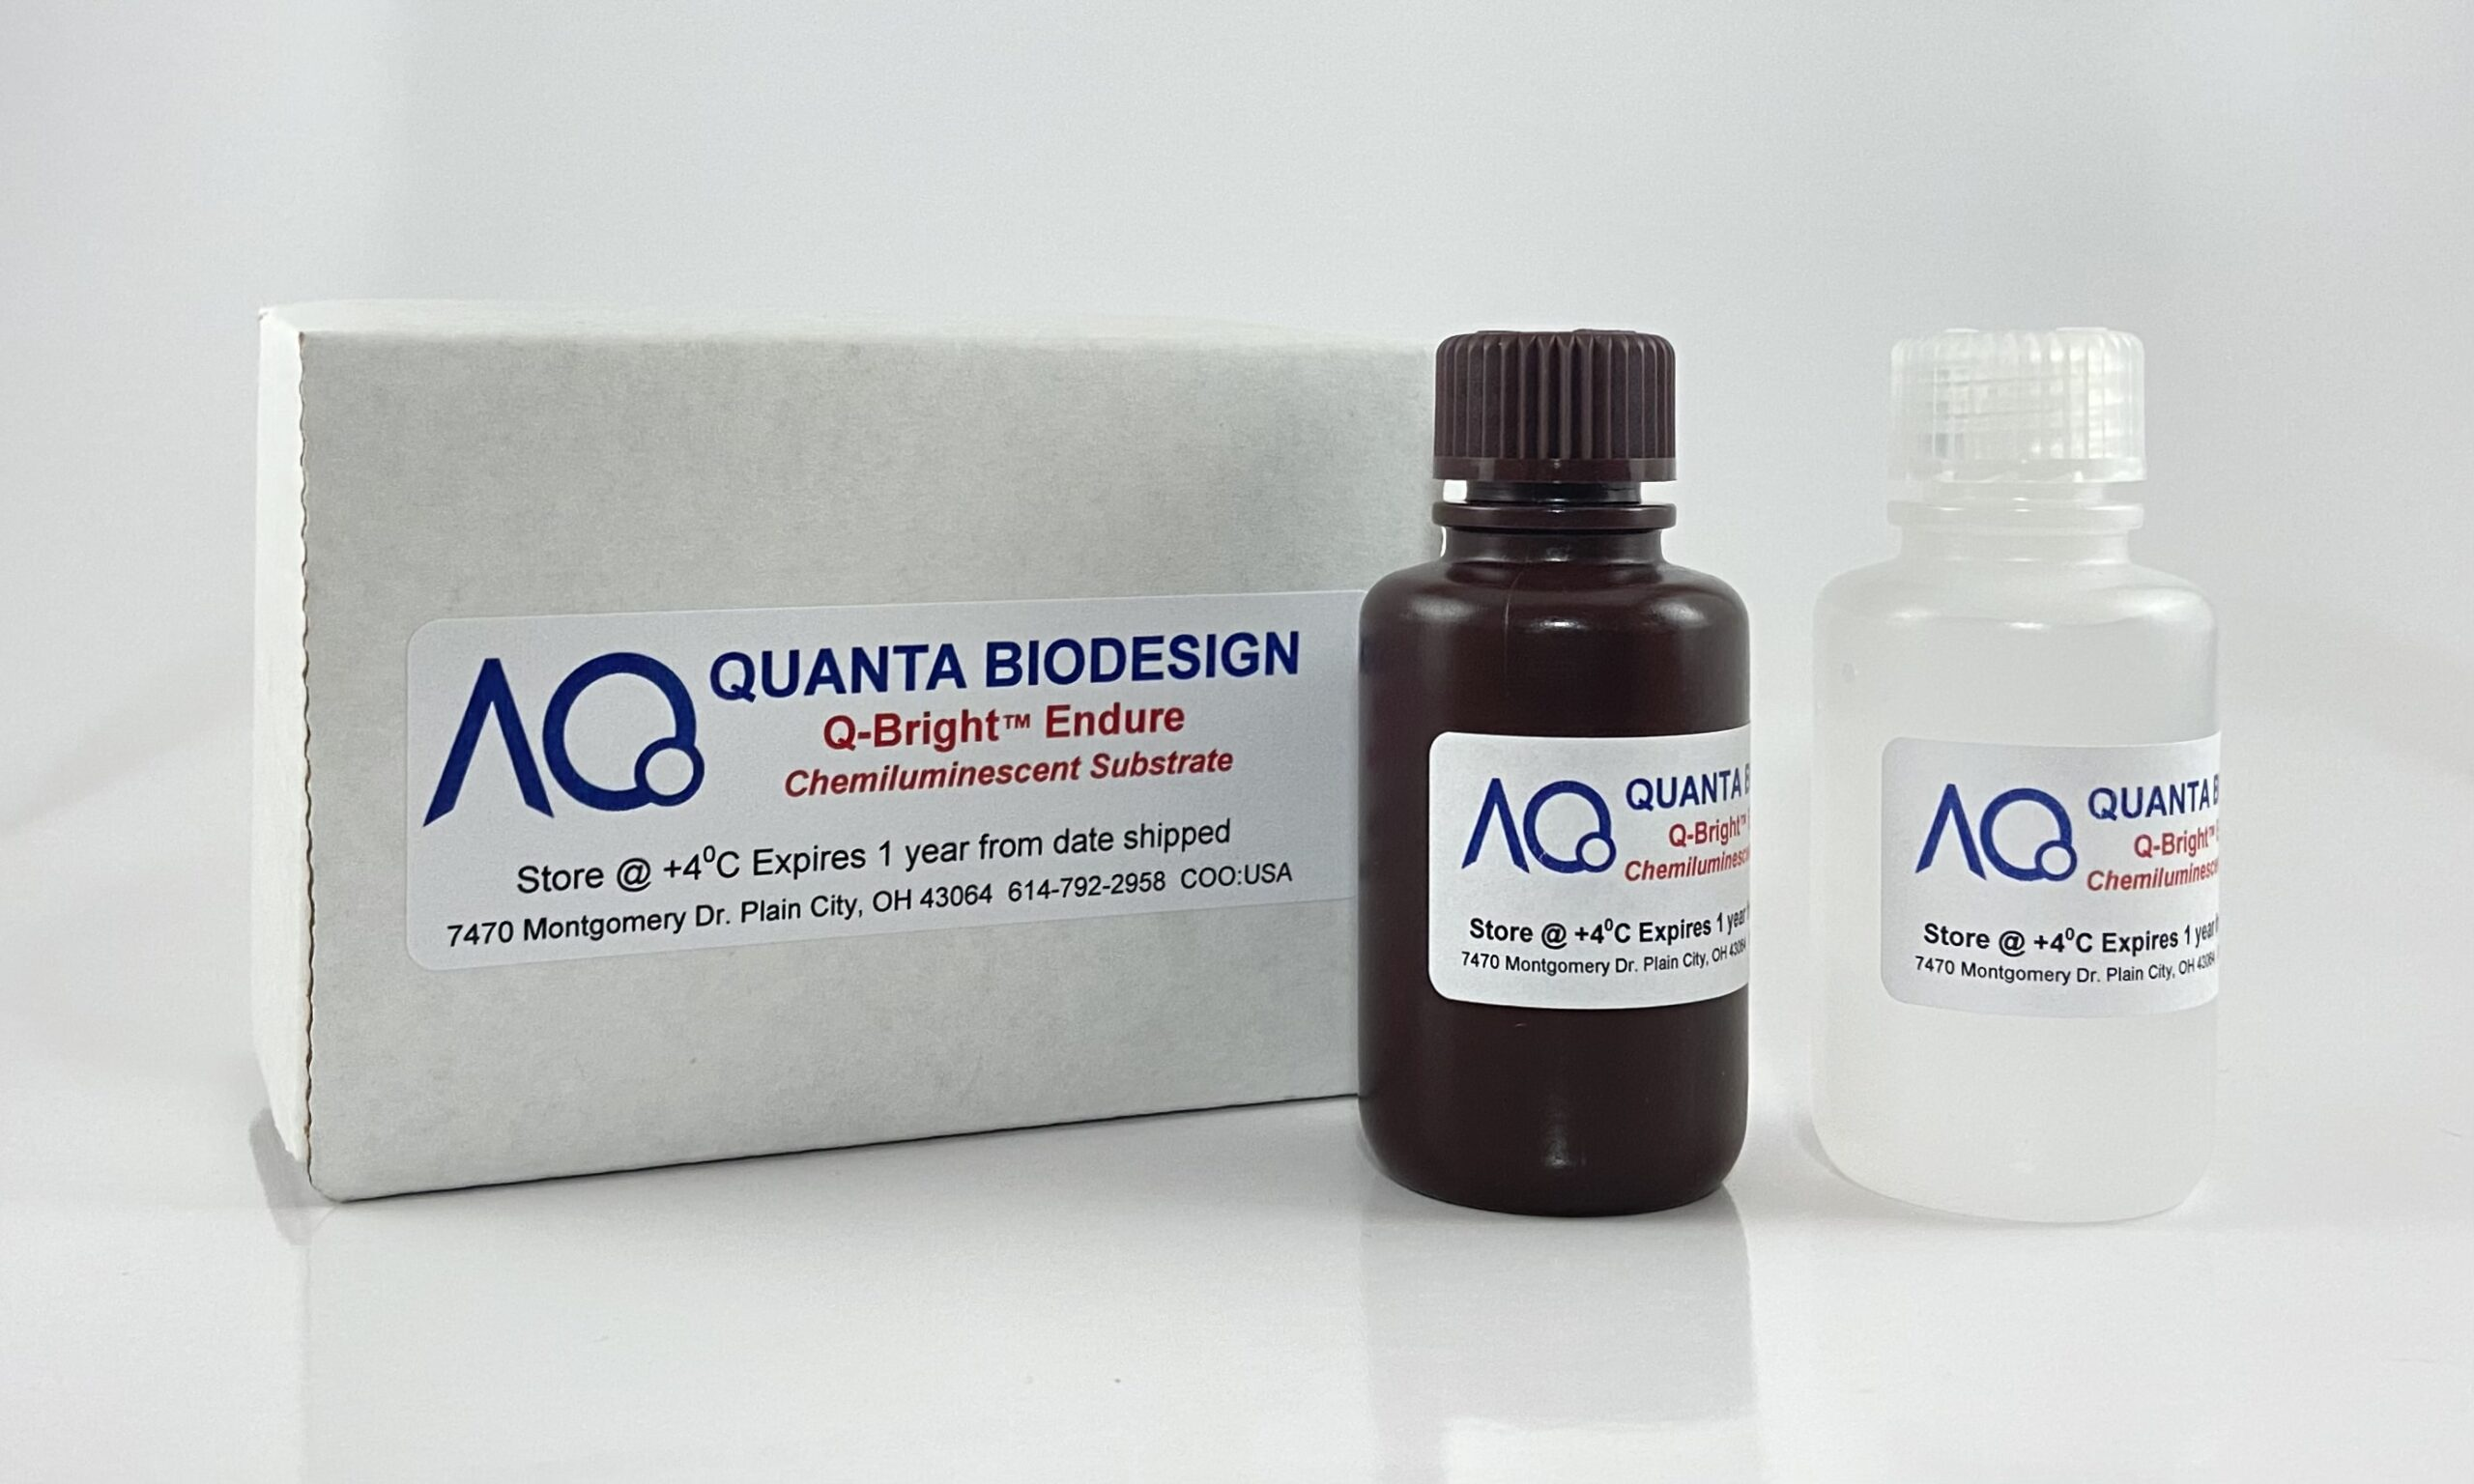 Q-Bright Endure Chemiluminescent Detection Kit